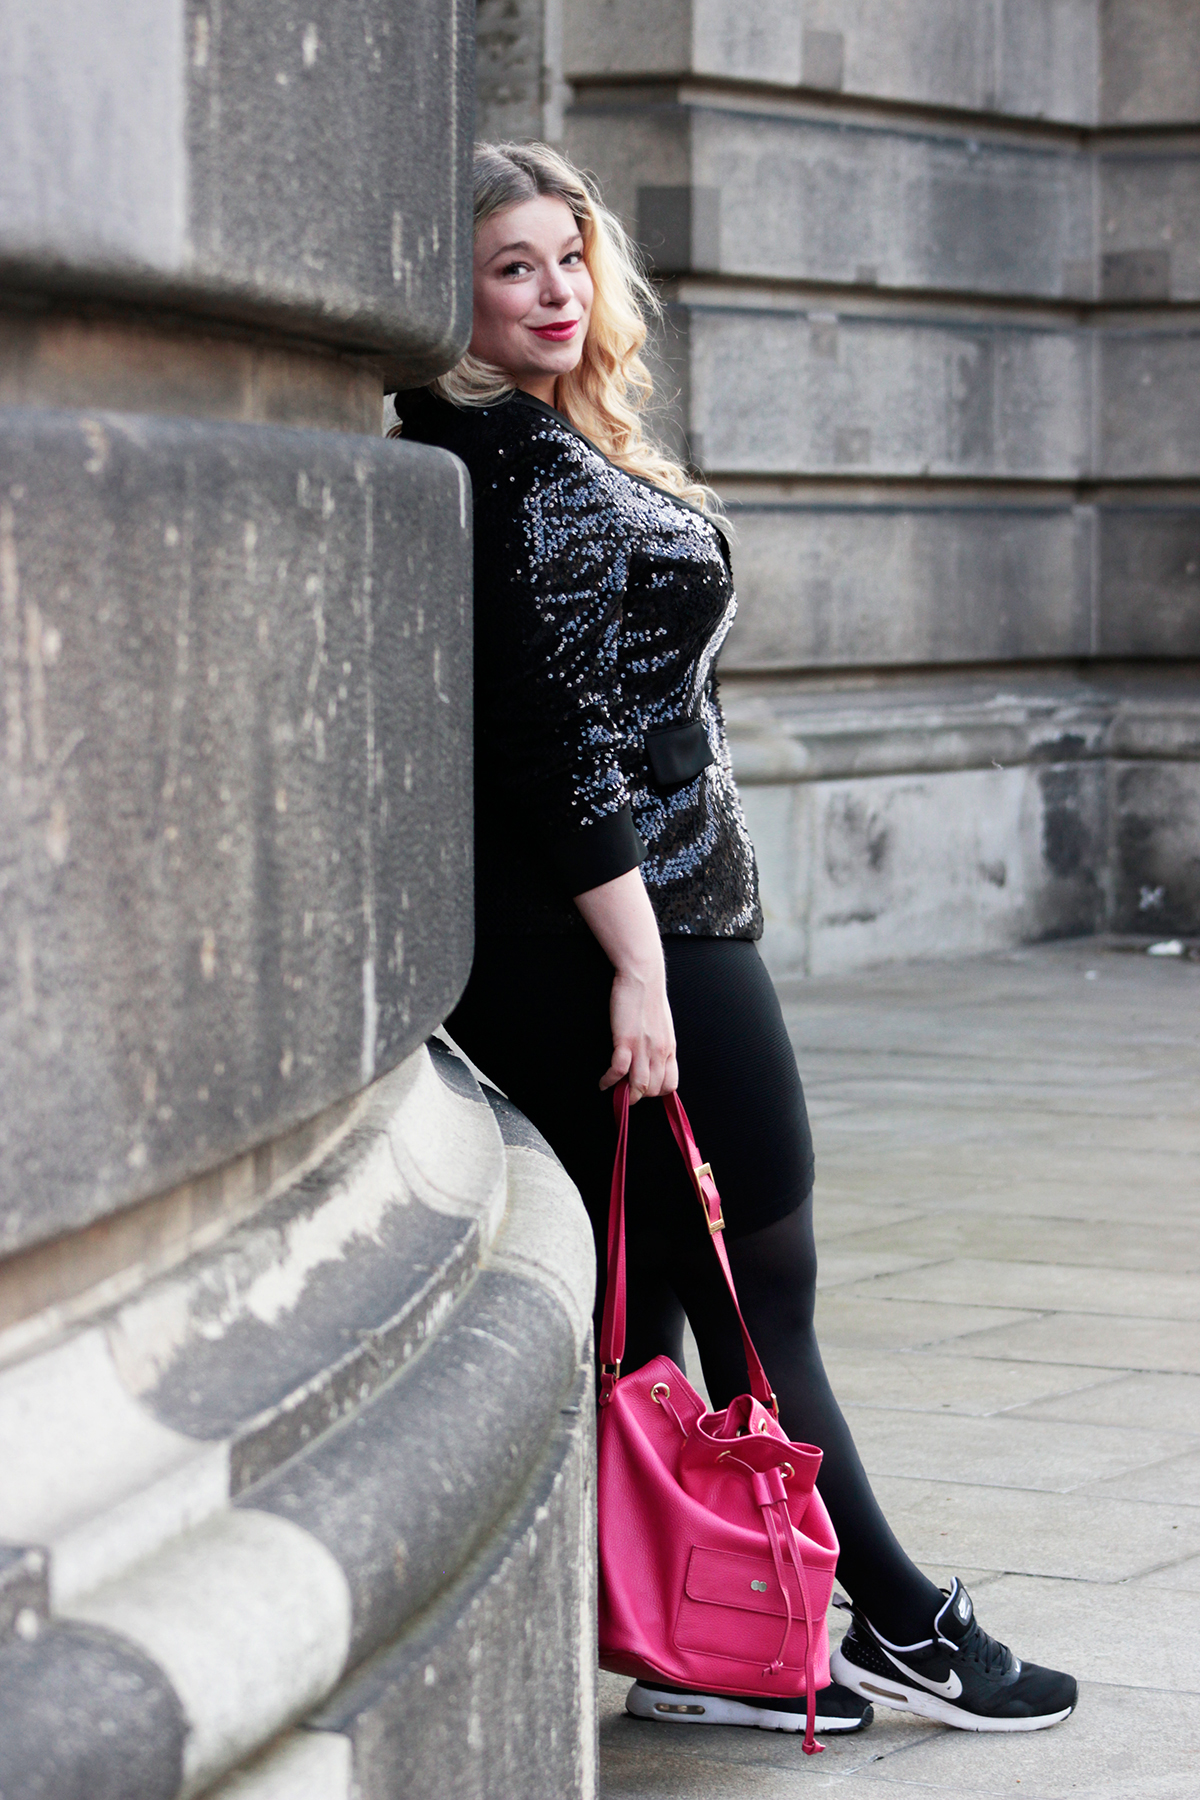 Plussize-Model-Plusmodel-Caterina-pogorzelski-Megabambi-Plussize-Look-curvystyle